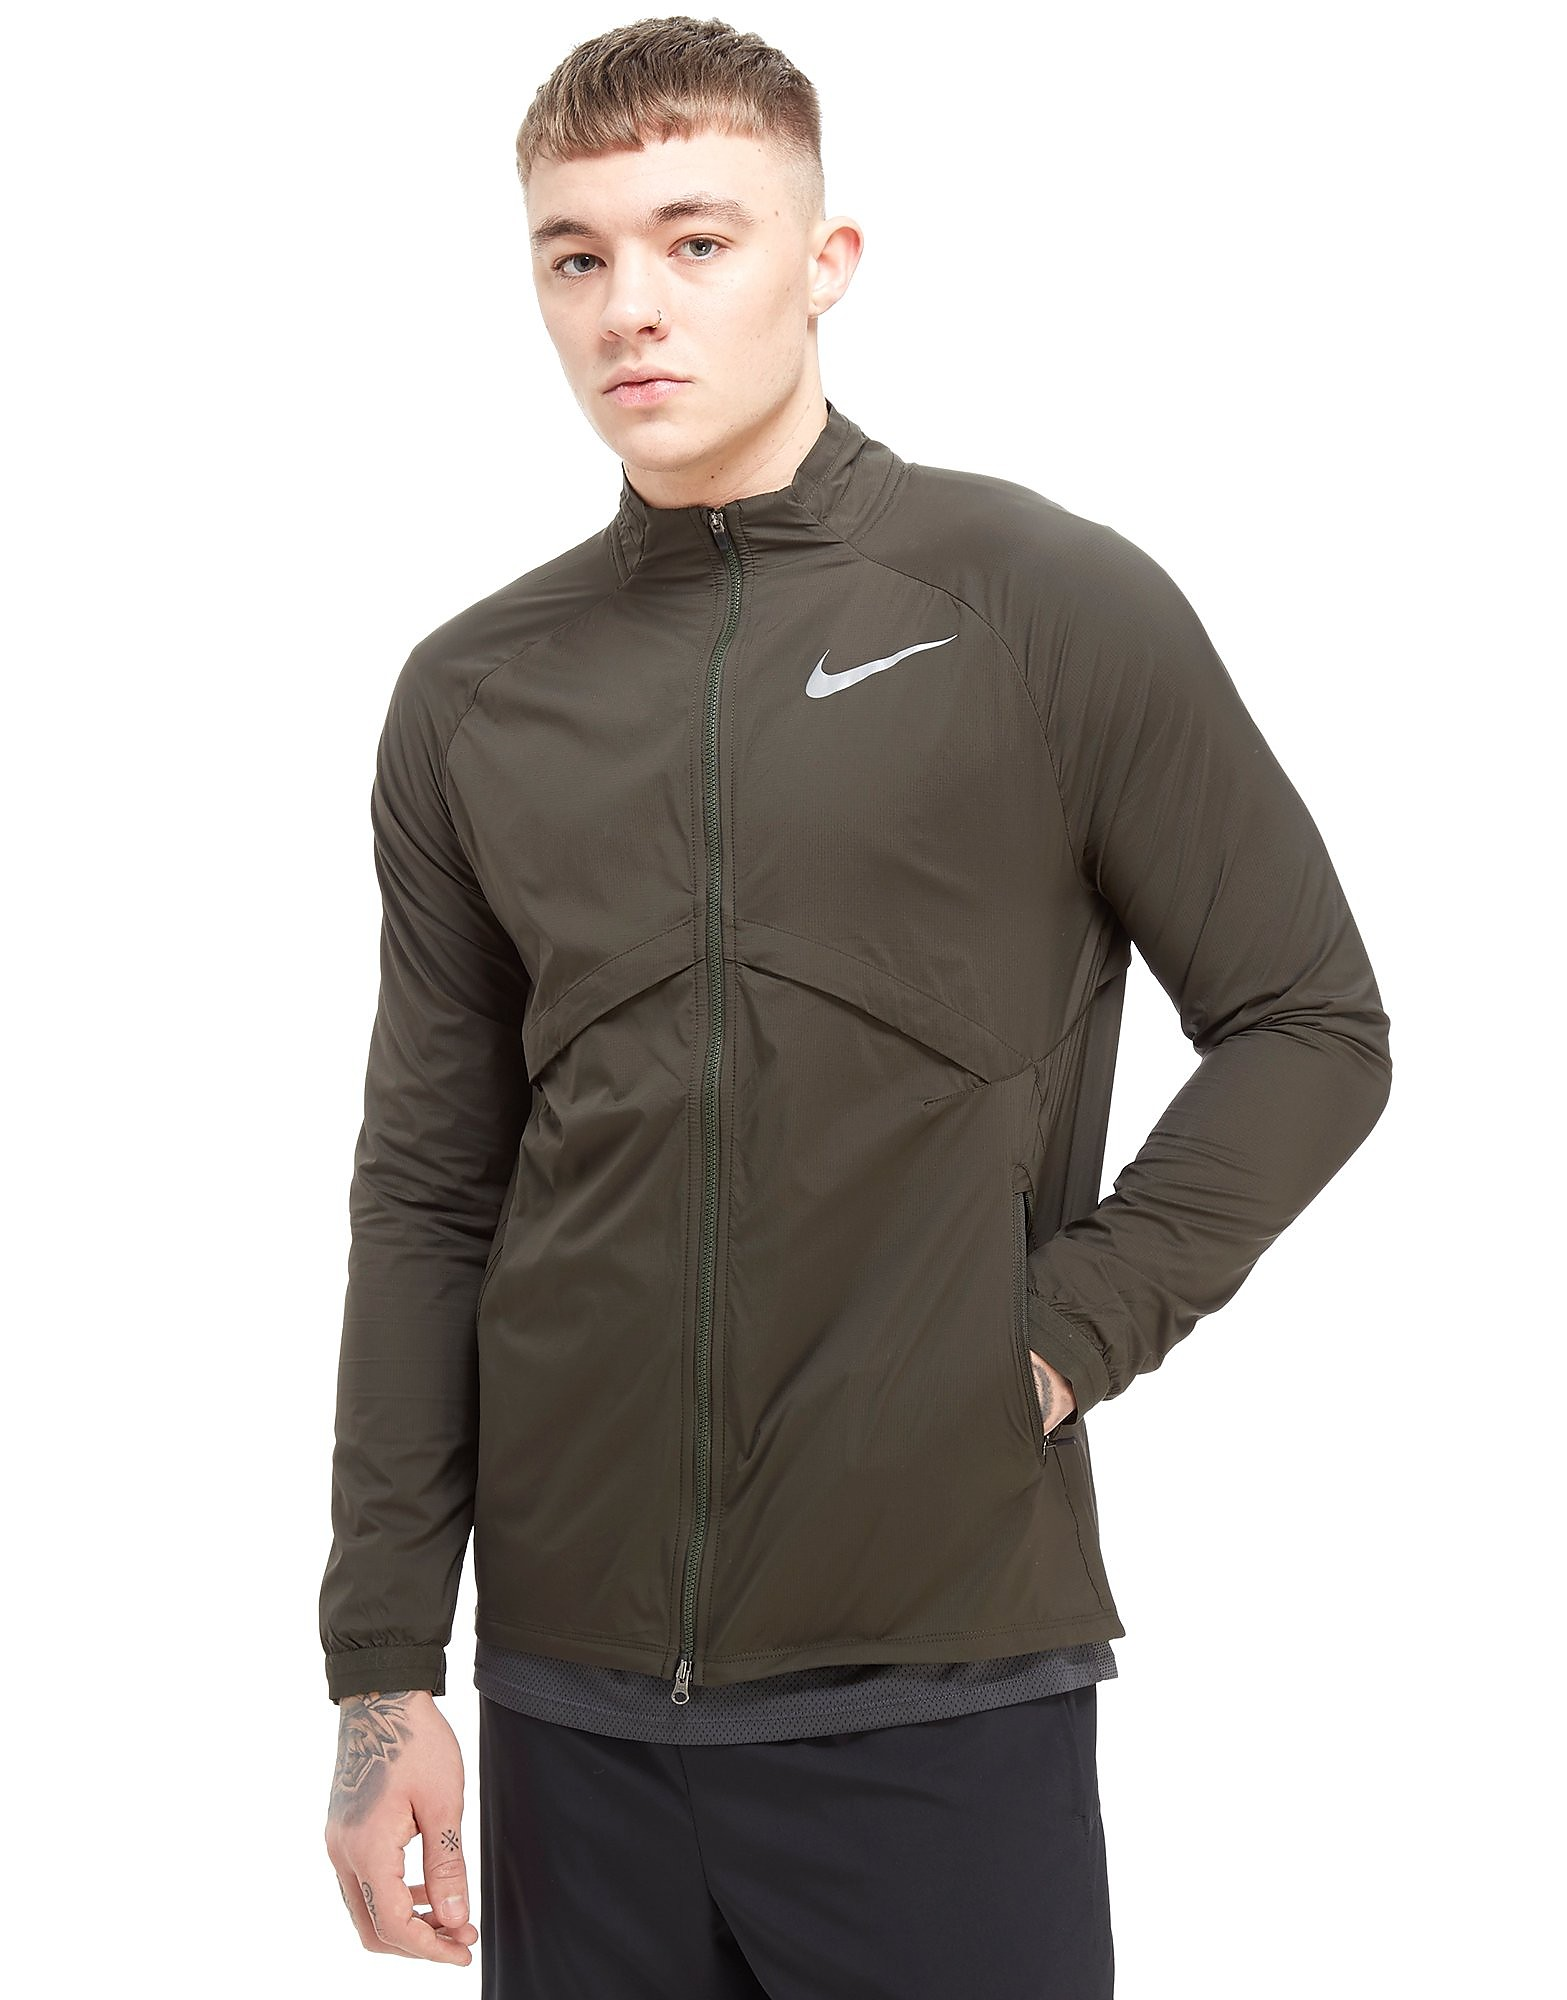 Nike Shield Convertible Jacket